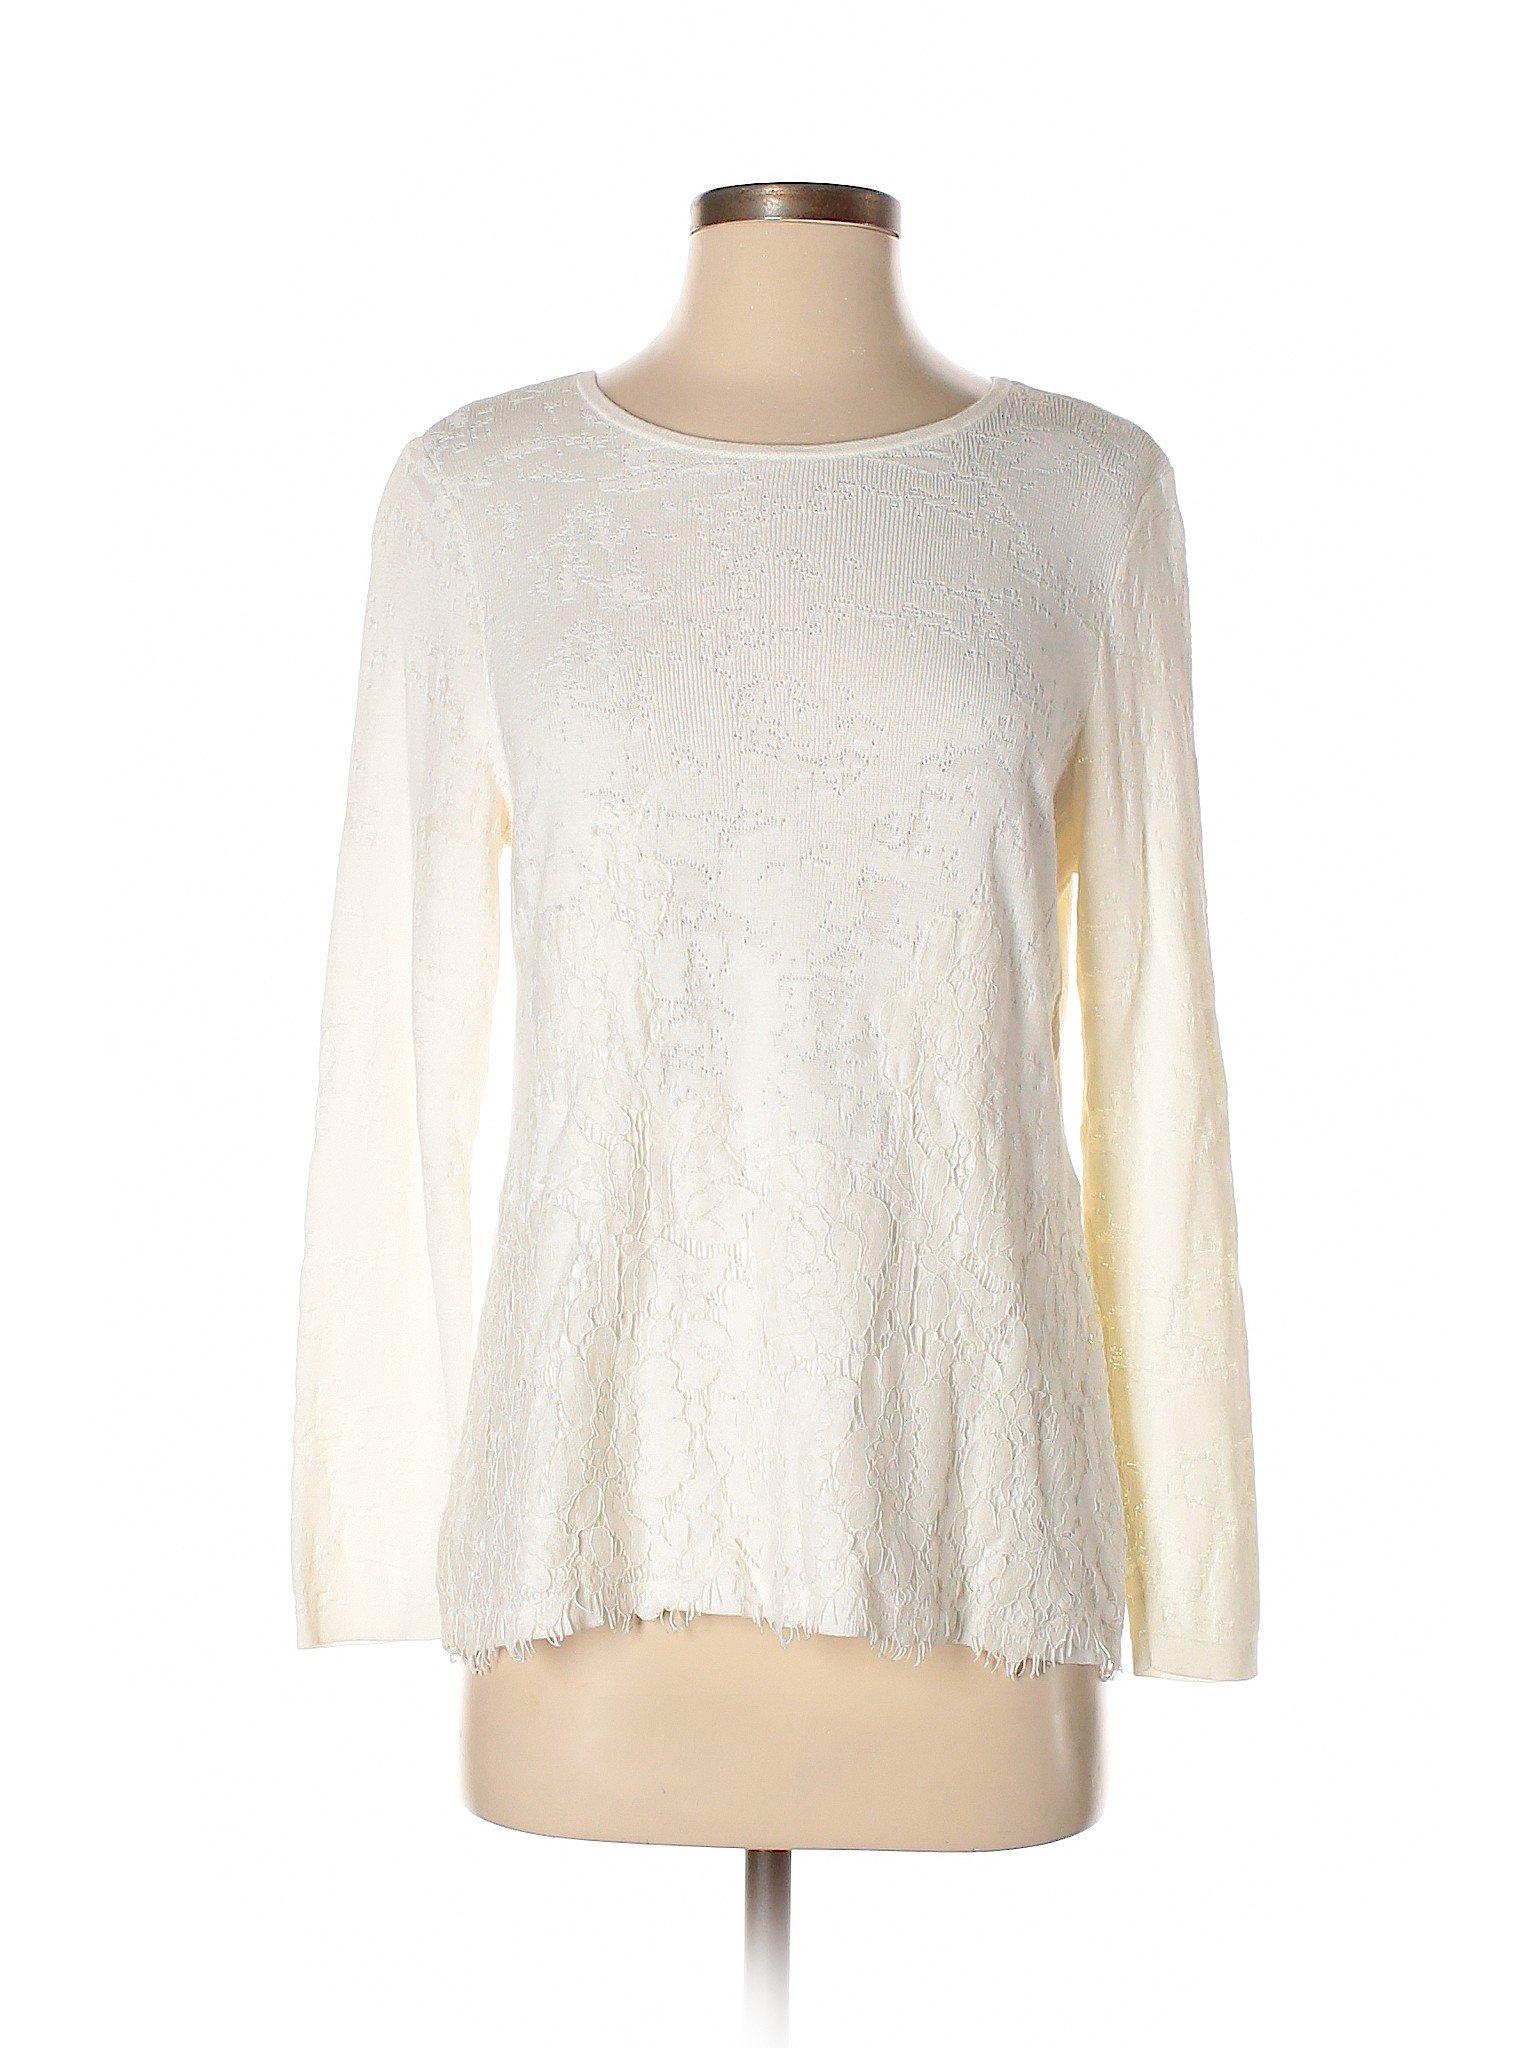 Pullover Boutique winter Boutique Chico's winter Sweater Chico's wqapSp